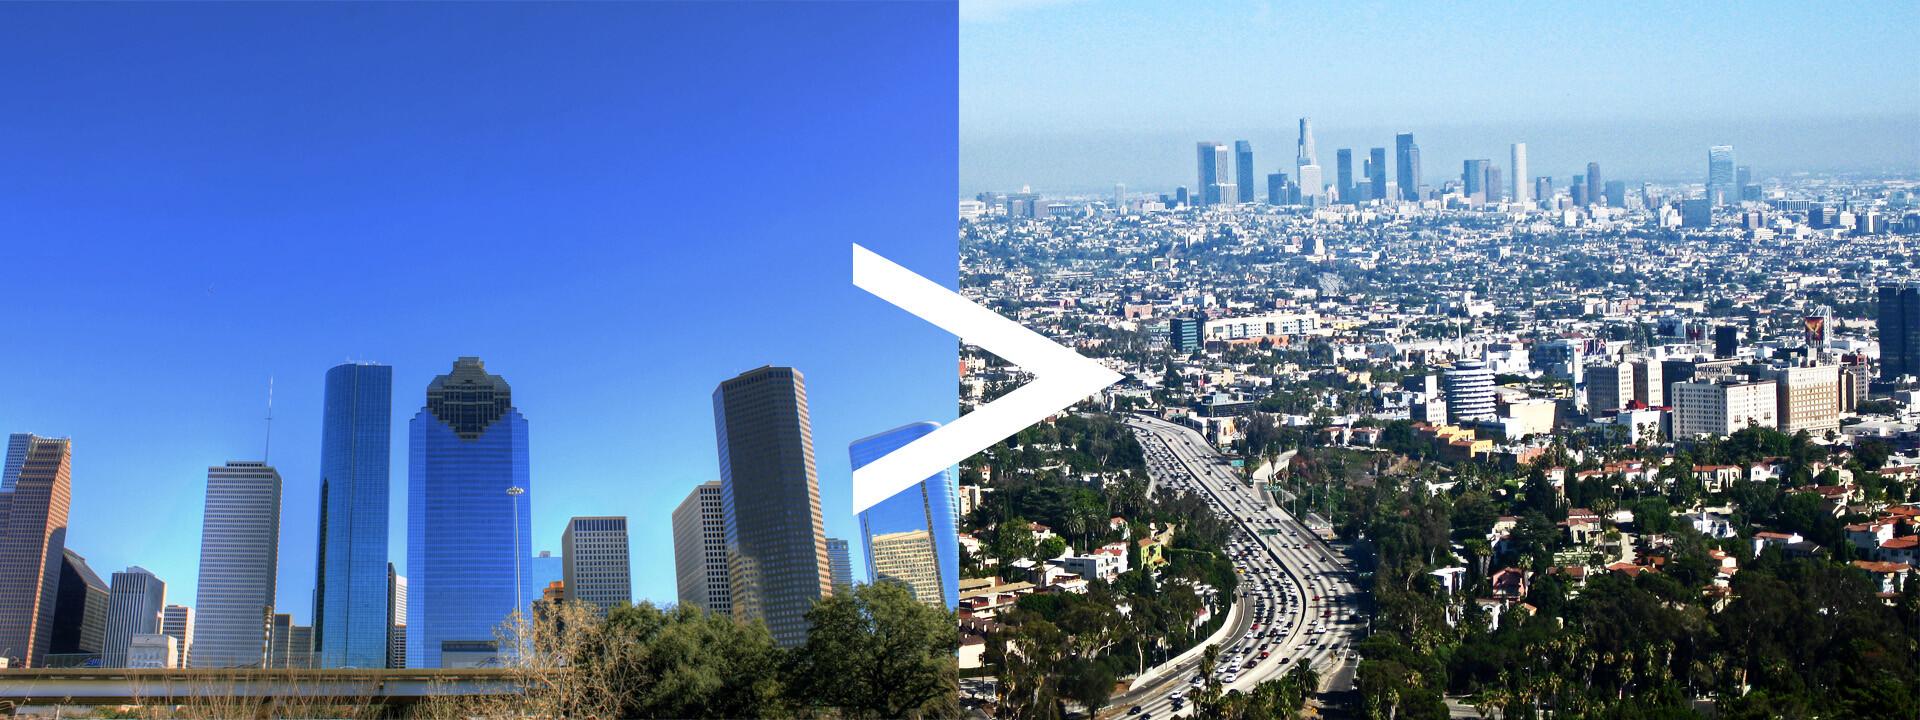 Auto Transport Route Houston to Los Angeles